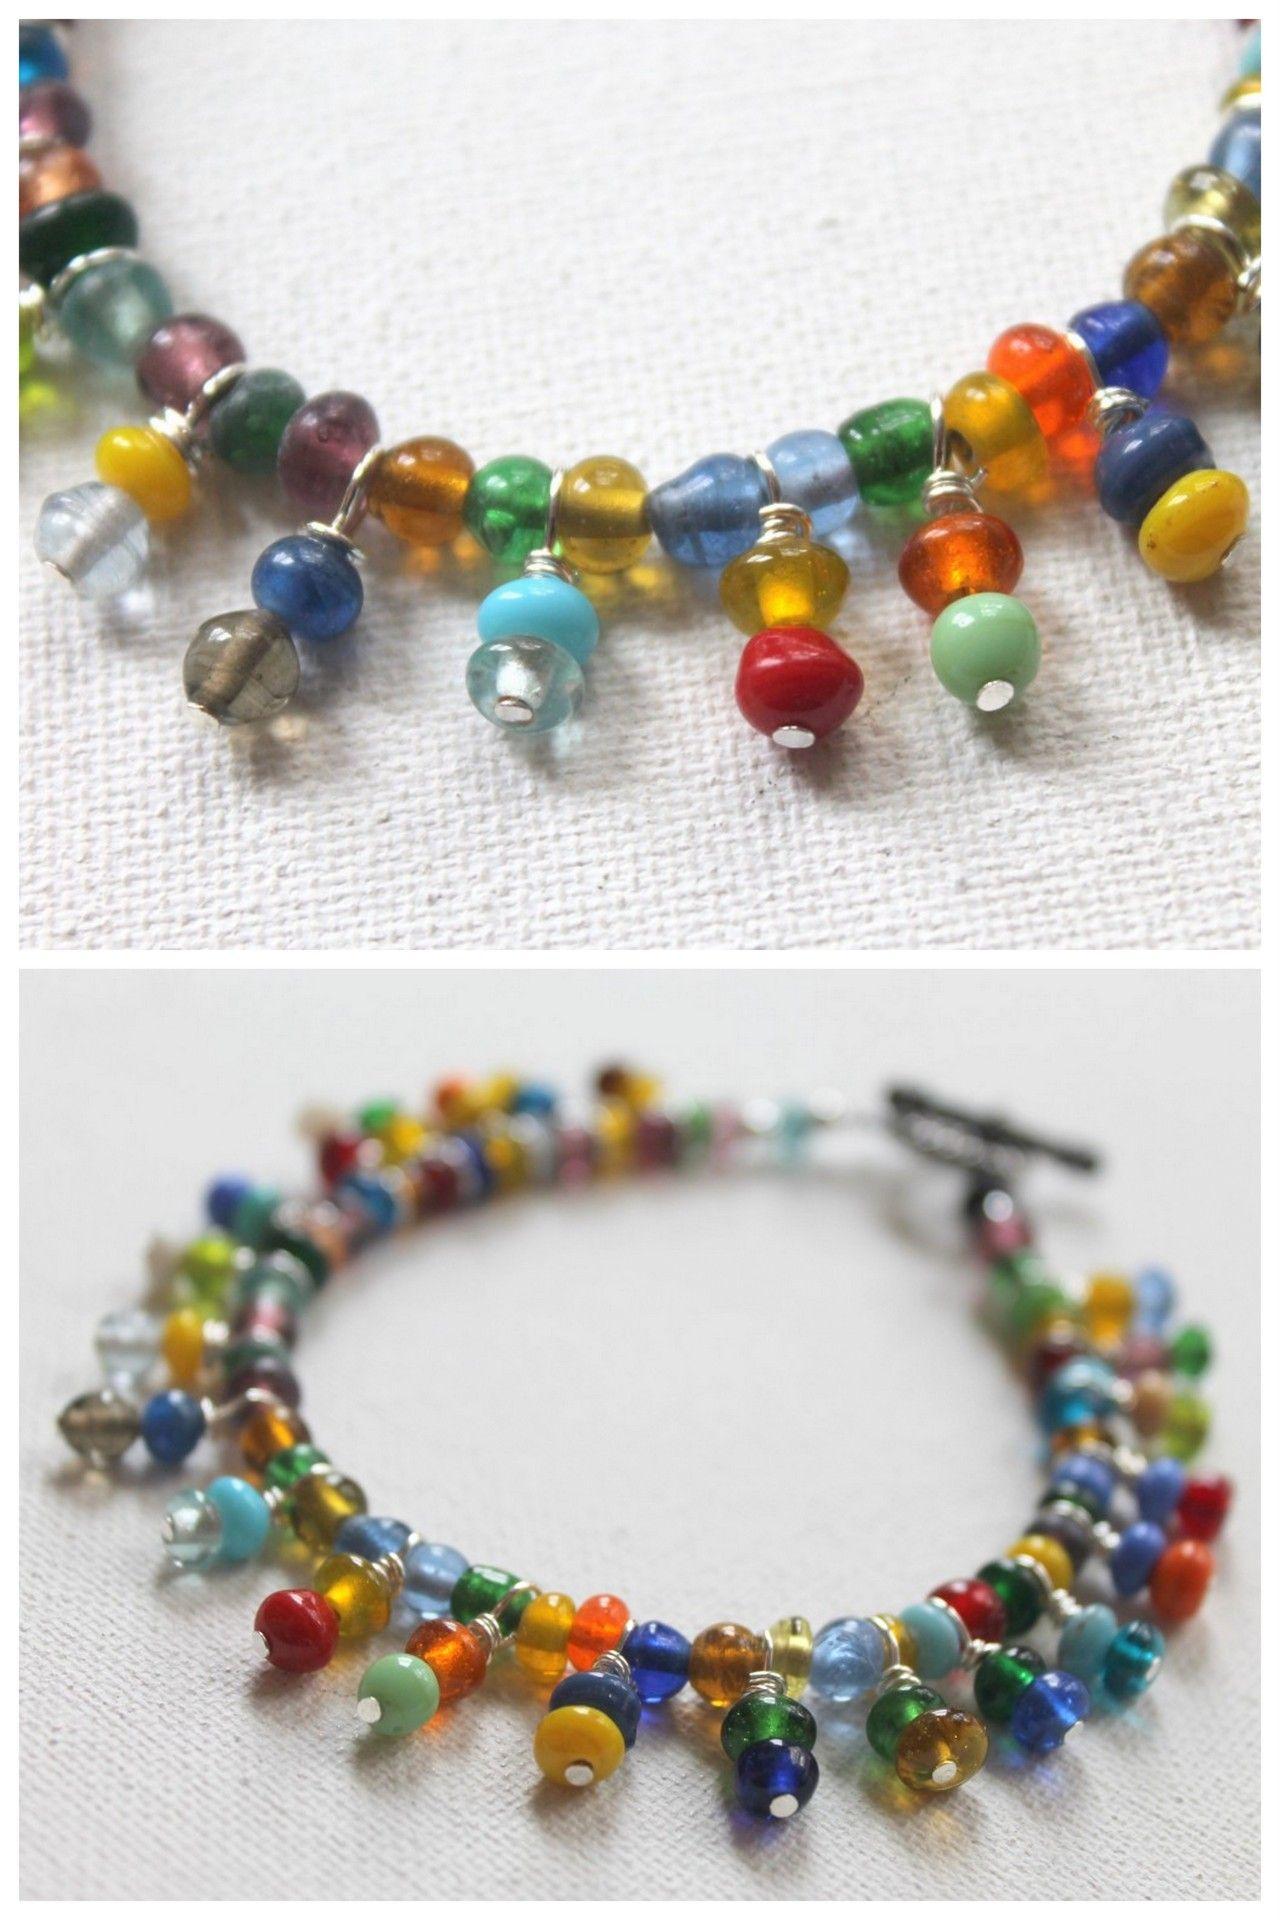 Diy bead dangle tutorial from emerging creativelytutorials